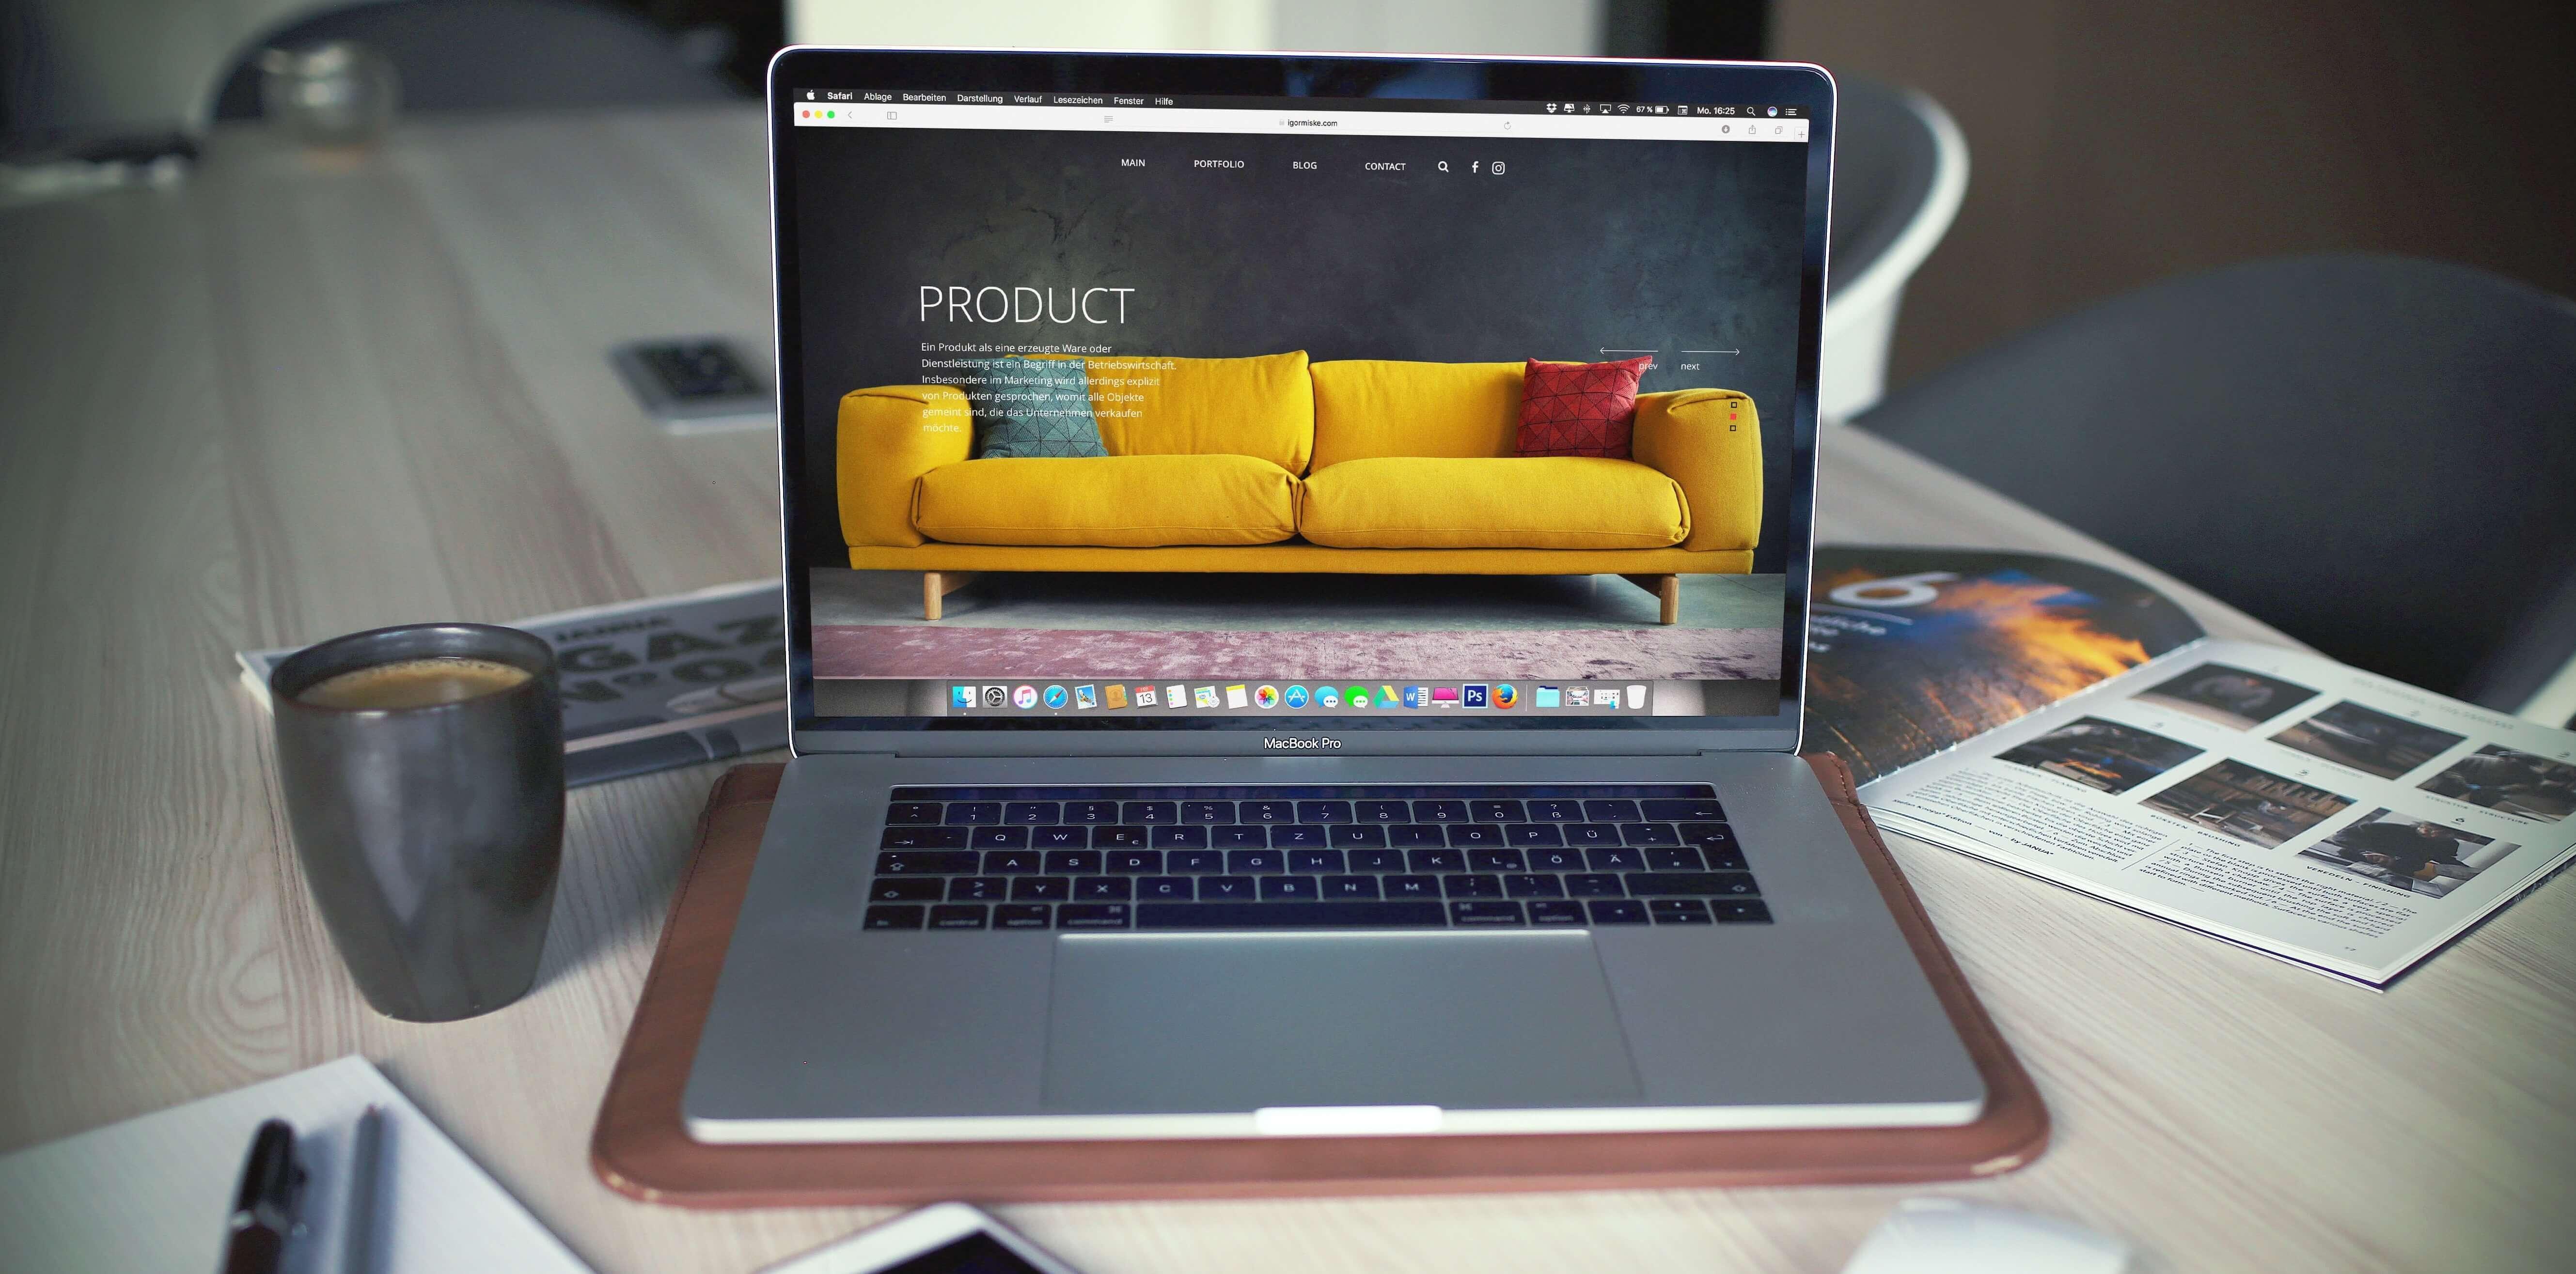 Produktmanager in der Konsumgüterindustrie